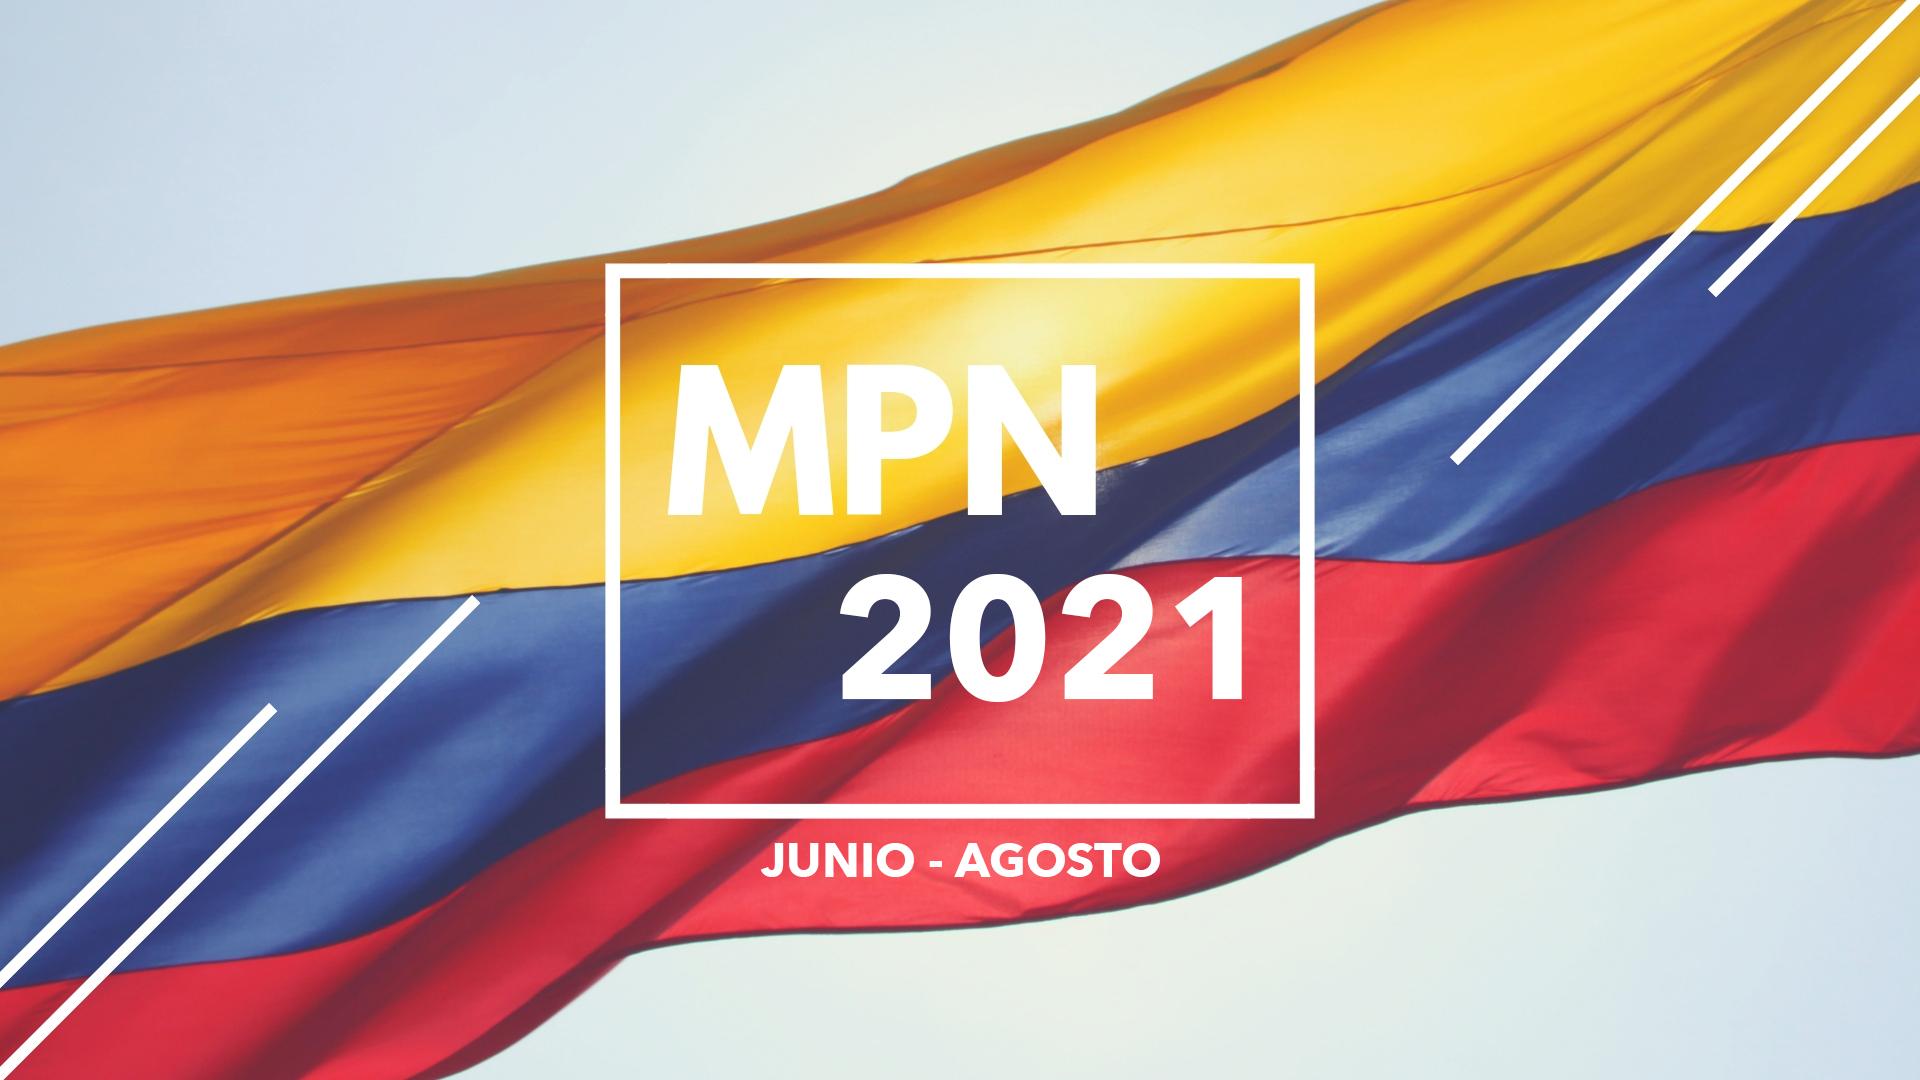 MPN 2021